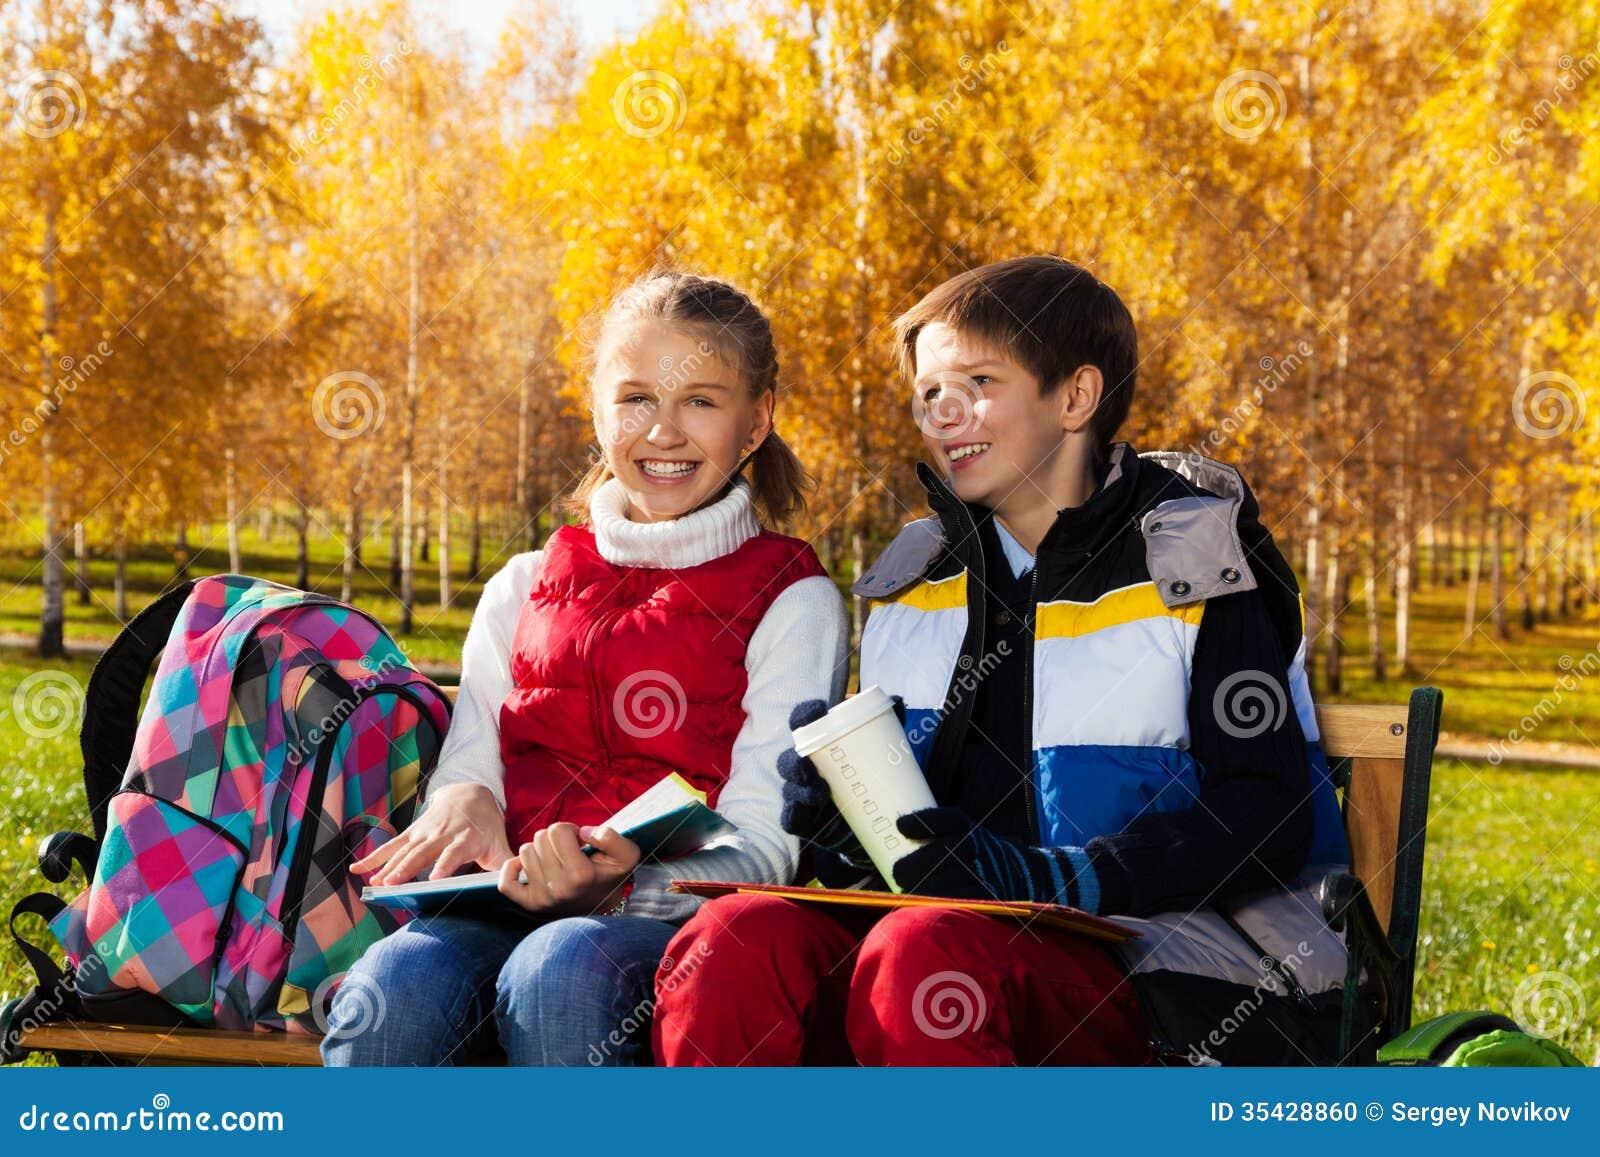 Laughing Couple School Kids Stock Photo - Image: 35428860